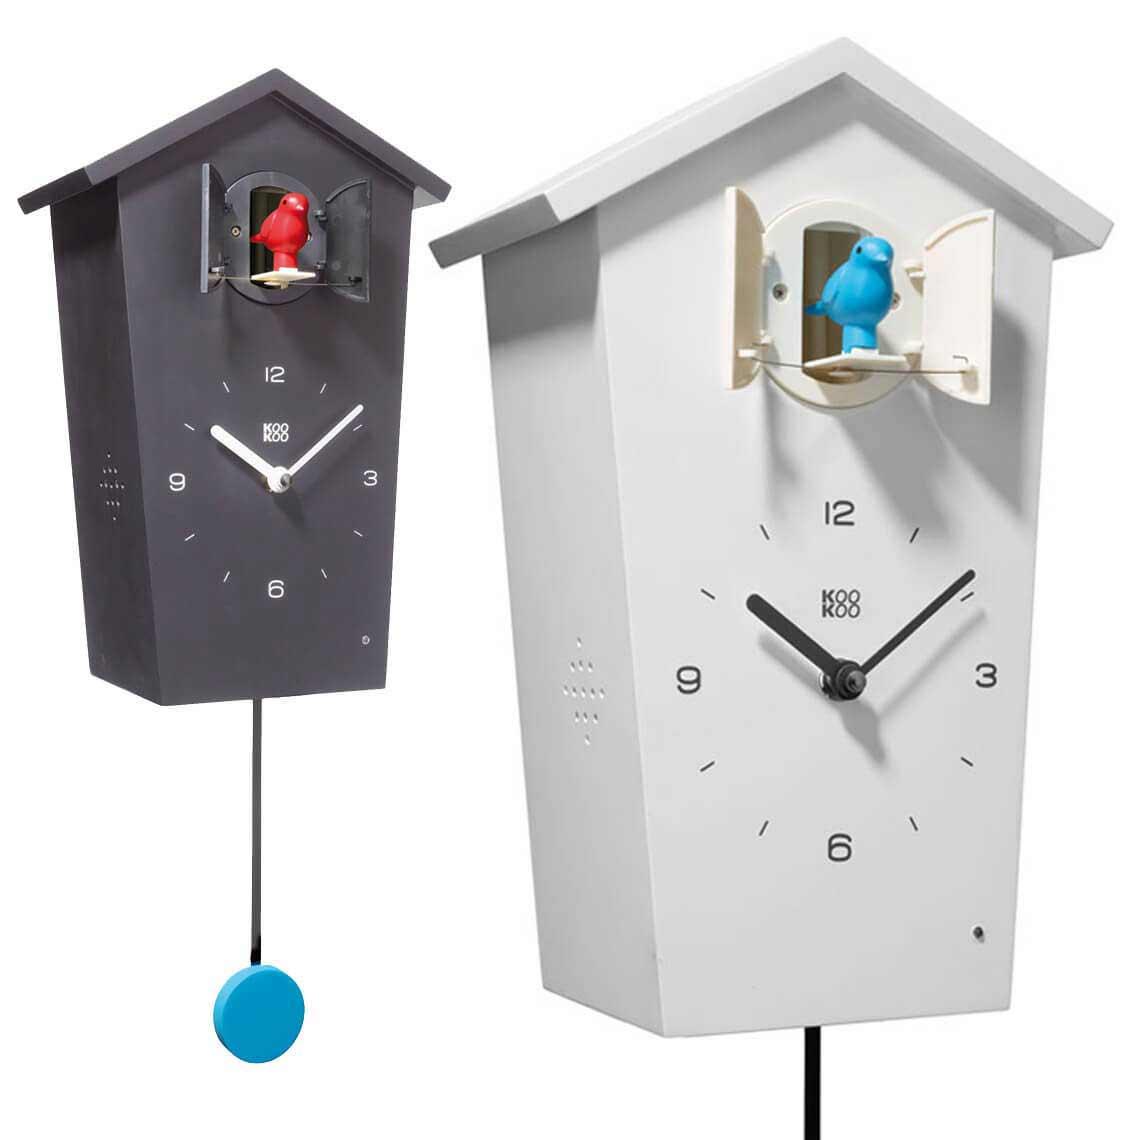 Cuckoo clock BirdHouse in black or white by KooKoo